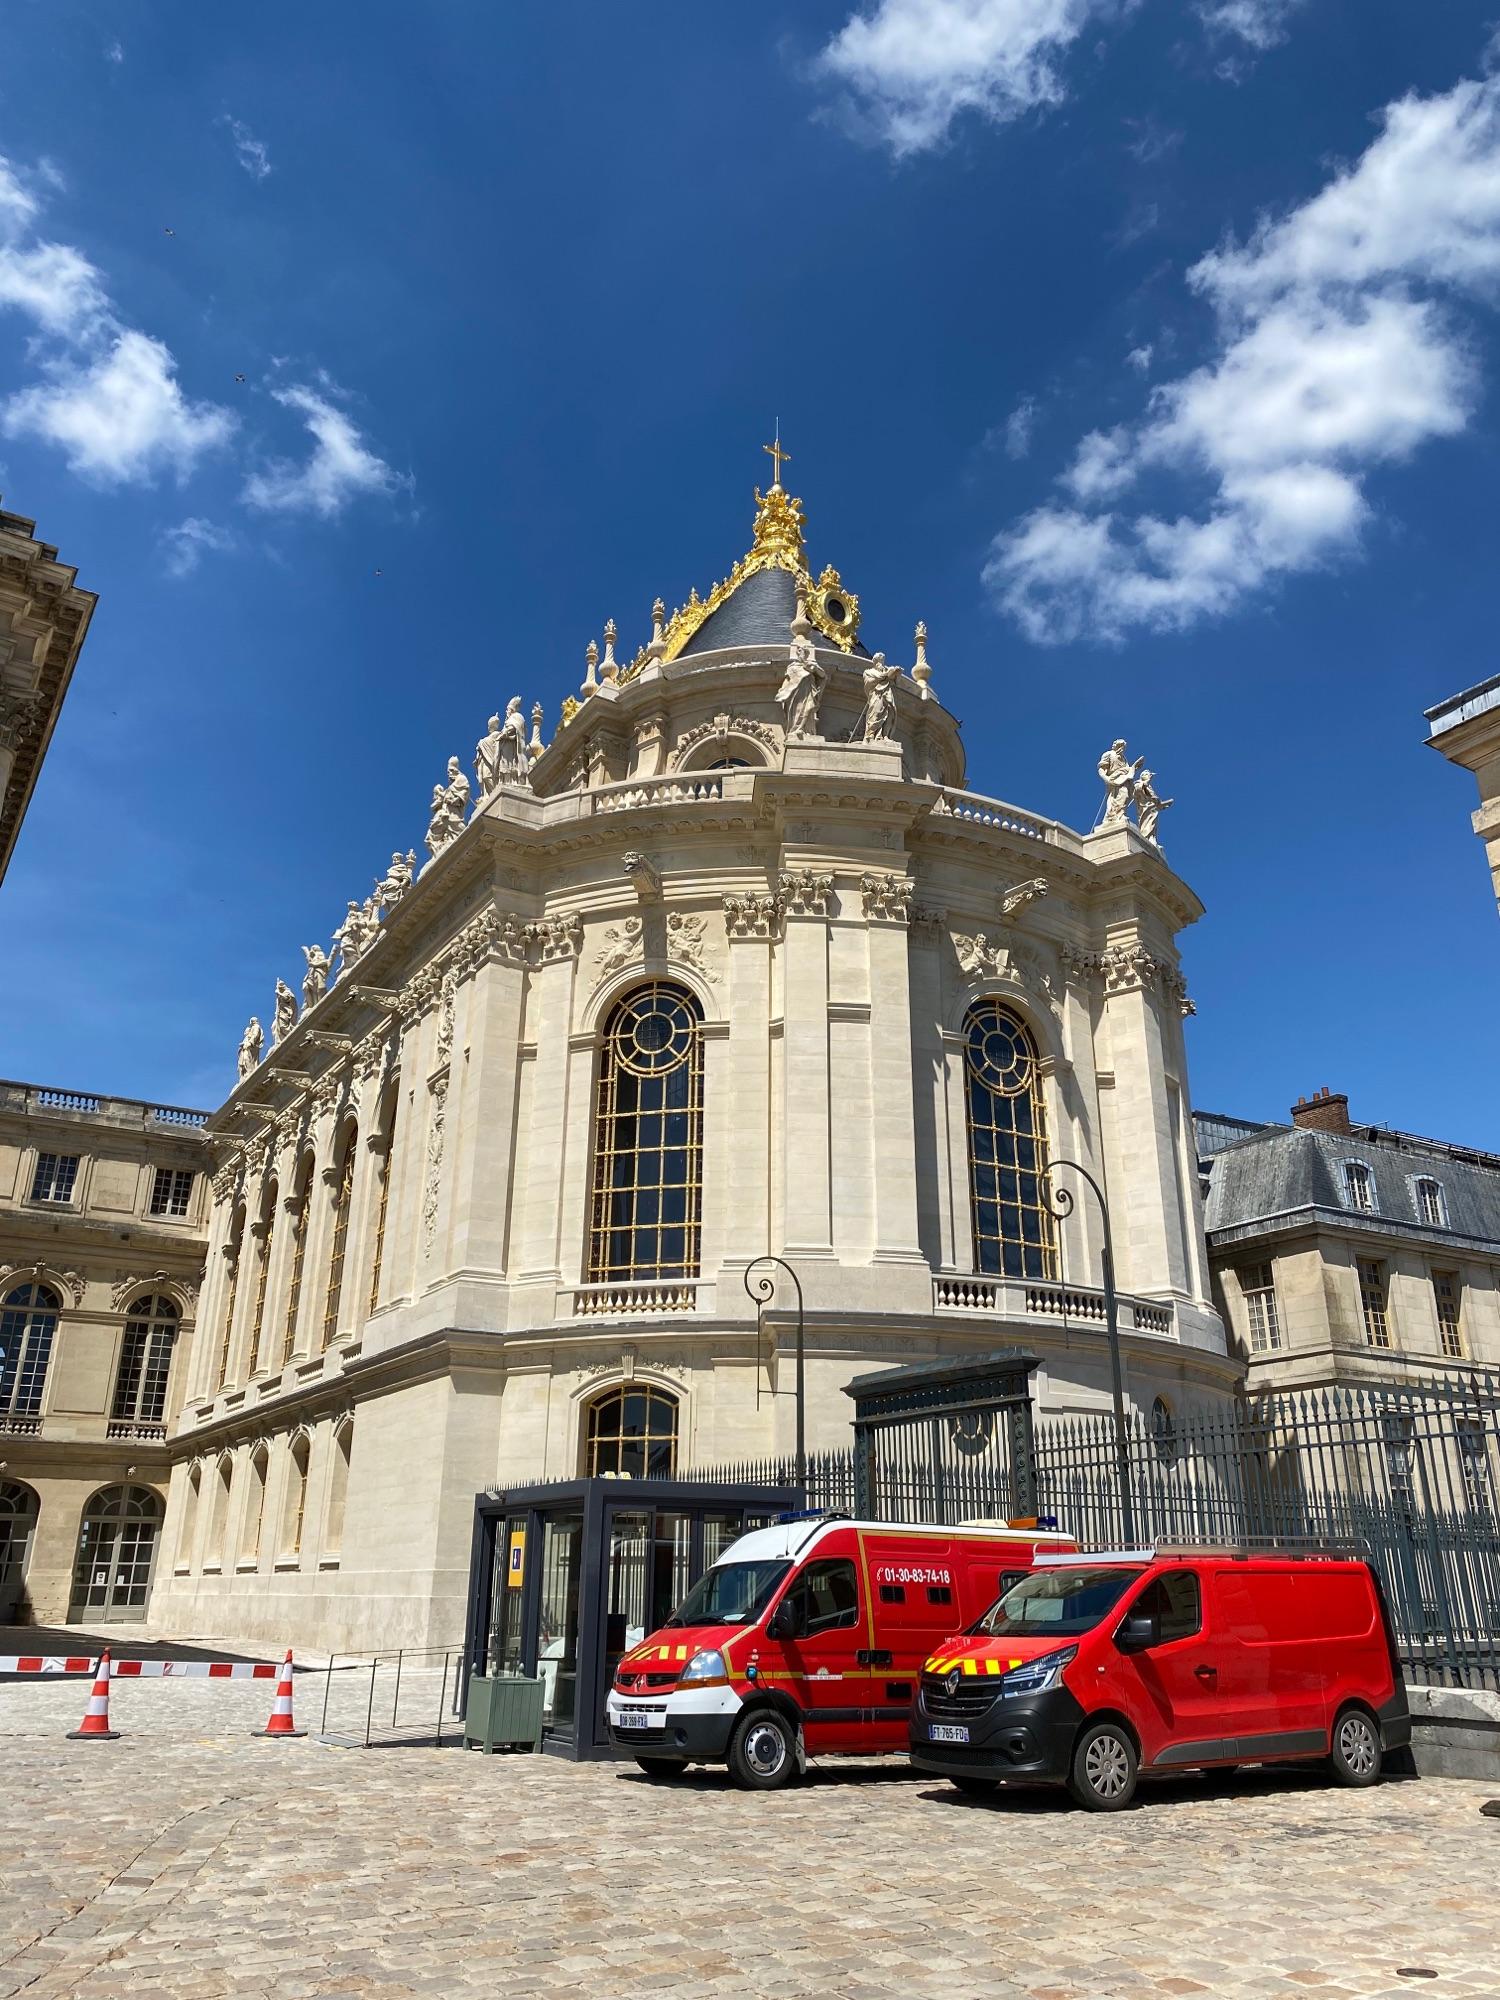 Позолотили долгострой в Версале. А билетов в шато на уик-энд нет совсем, на три недели вперёд.